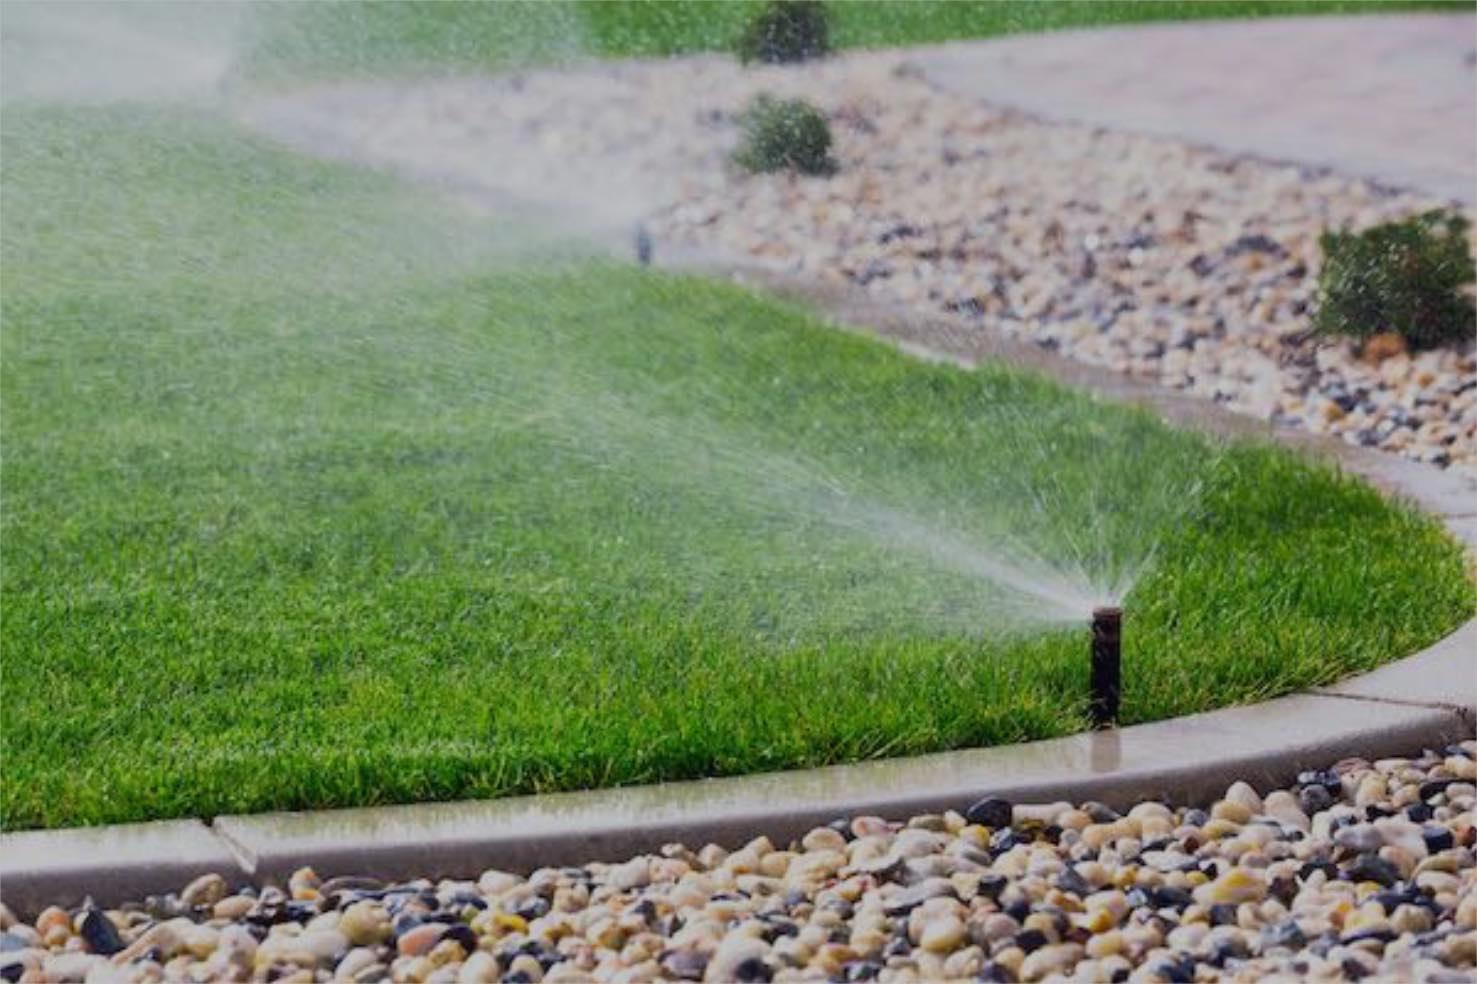 irrigation sprinklers spraying